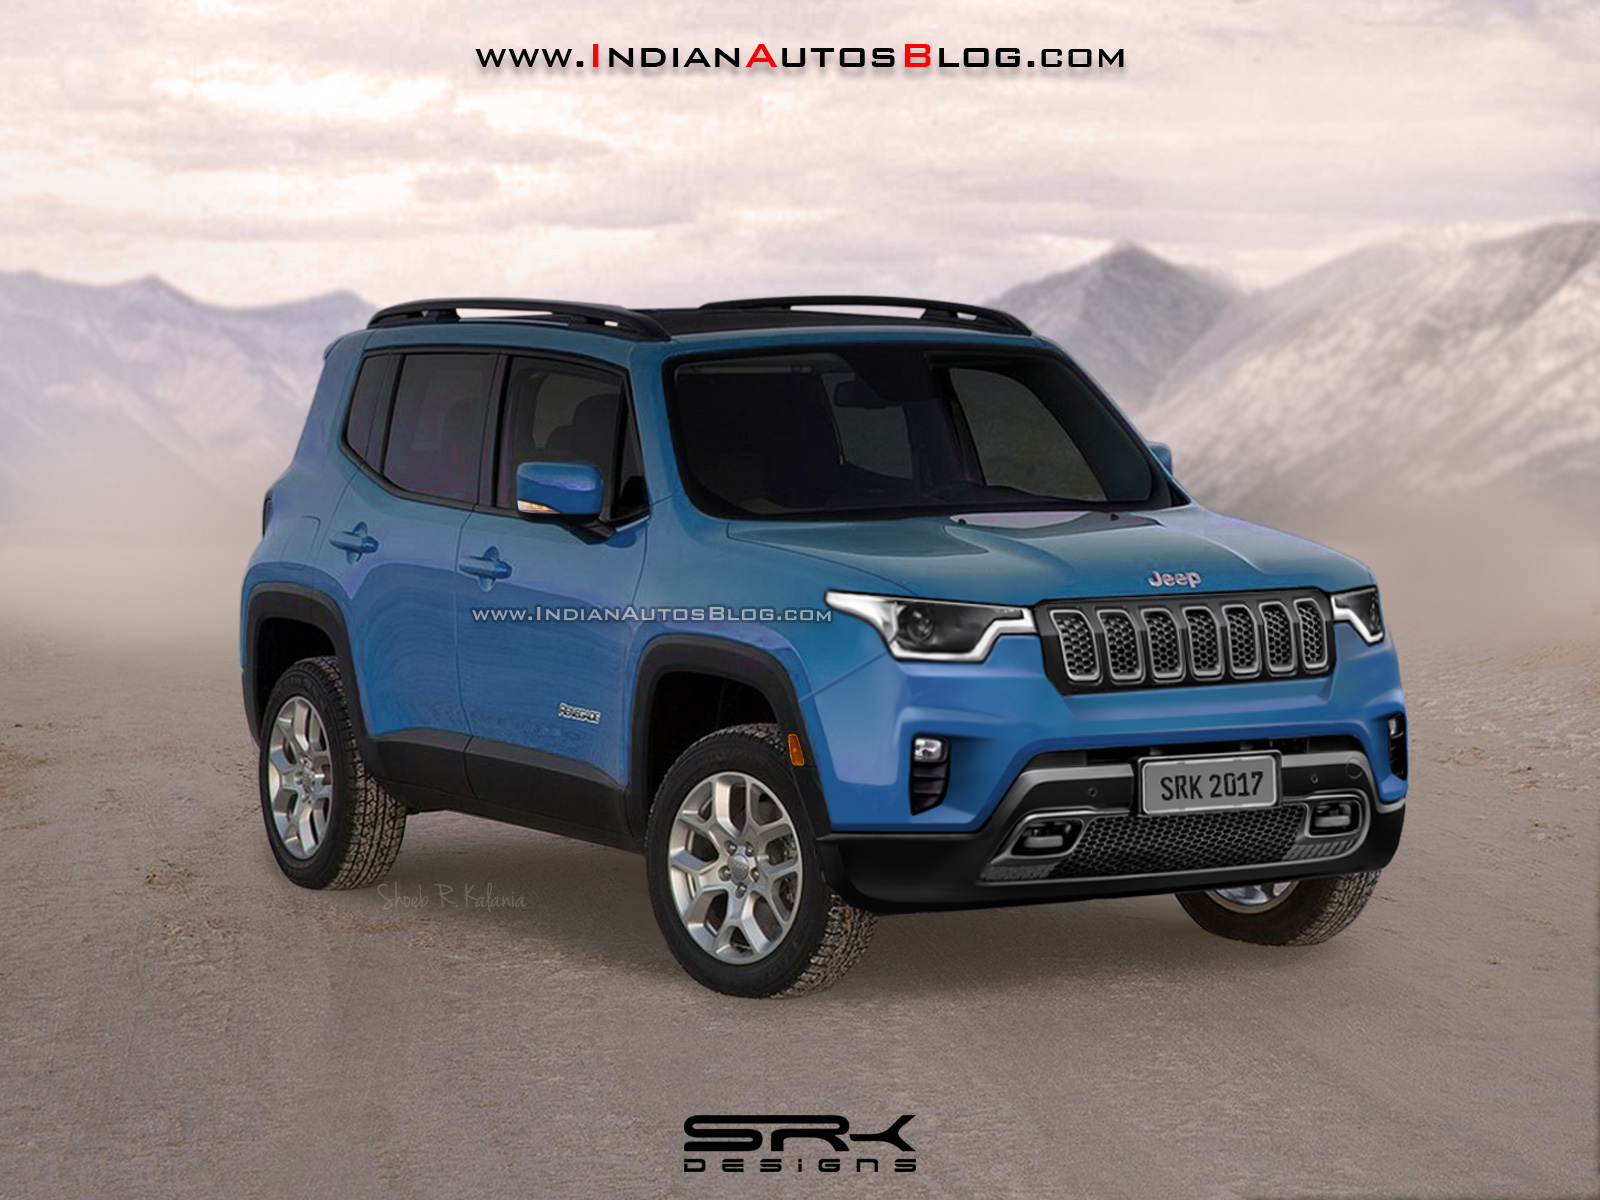 2018 jeep renegade colors. Contemporary Renegade Wajah Baru Jeep Renegade Mulai Terkuak On 2018 Jeep Renegade Colors I